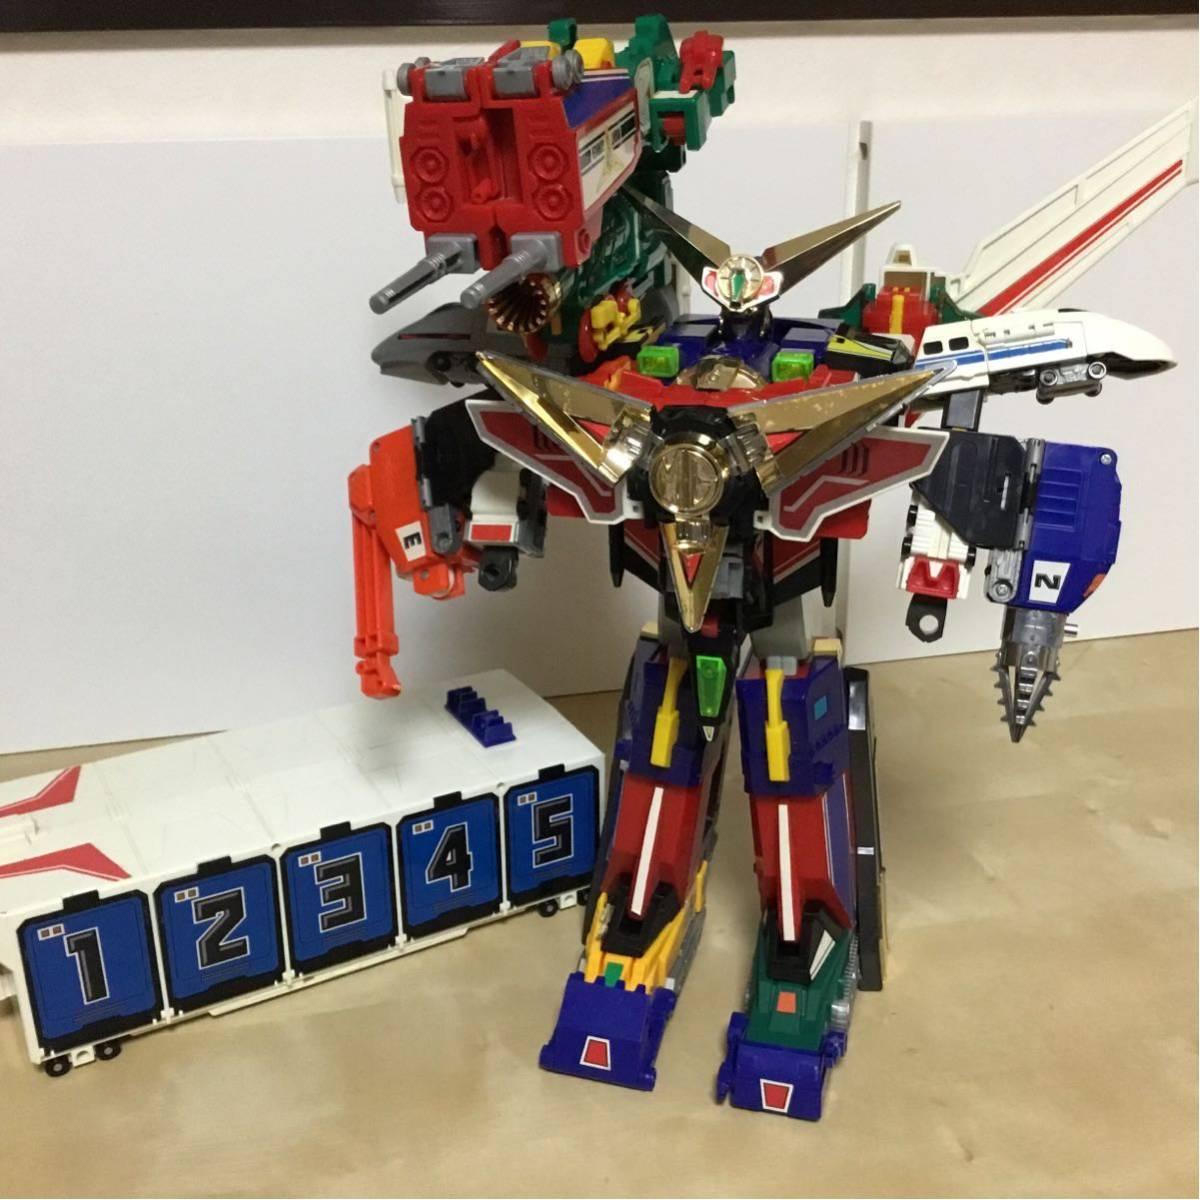 DX 勇者ロボ シリーズ グレートマイトガイン マイトカイザー 当時物 検( おもちゃ セット ロボット 勇者 スーパー戦隊 タカラ transformers